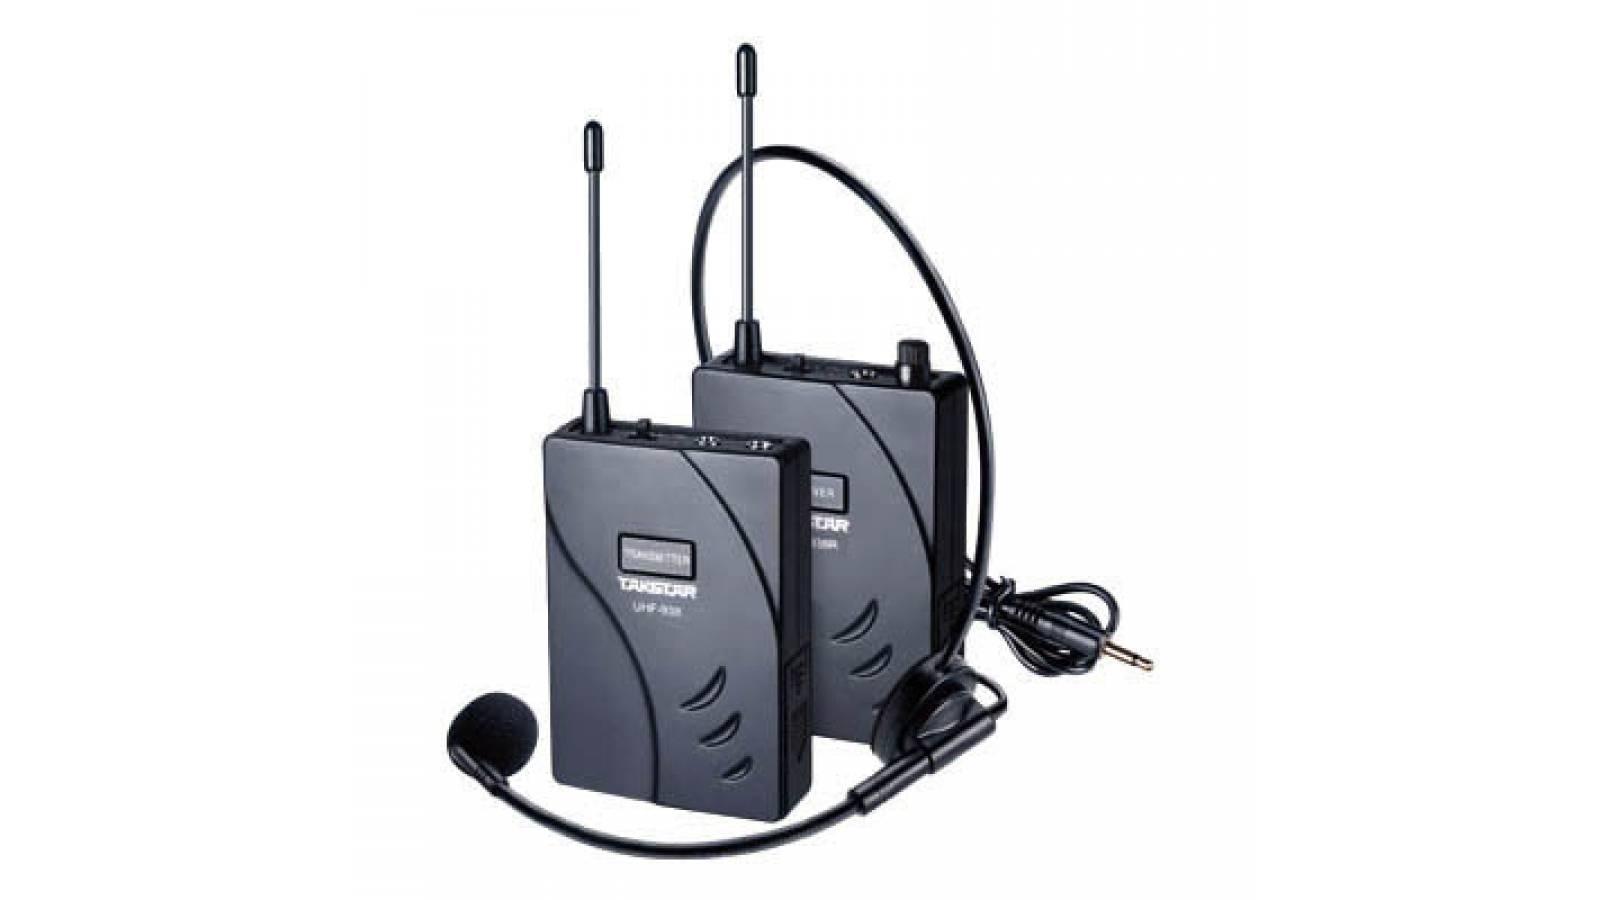 Sistema inalambrico para guia de tour Takstar UHF-938